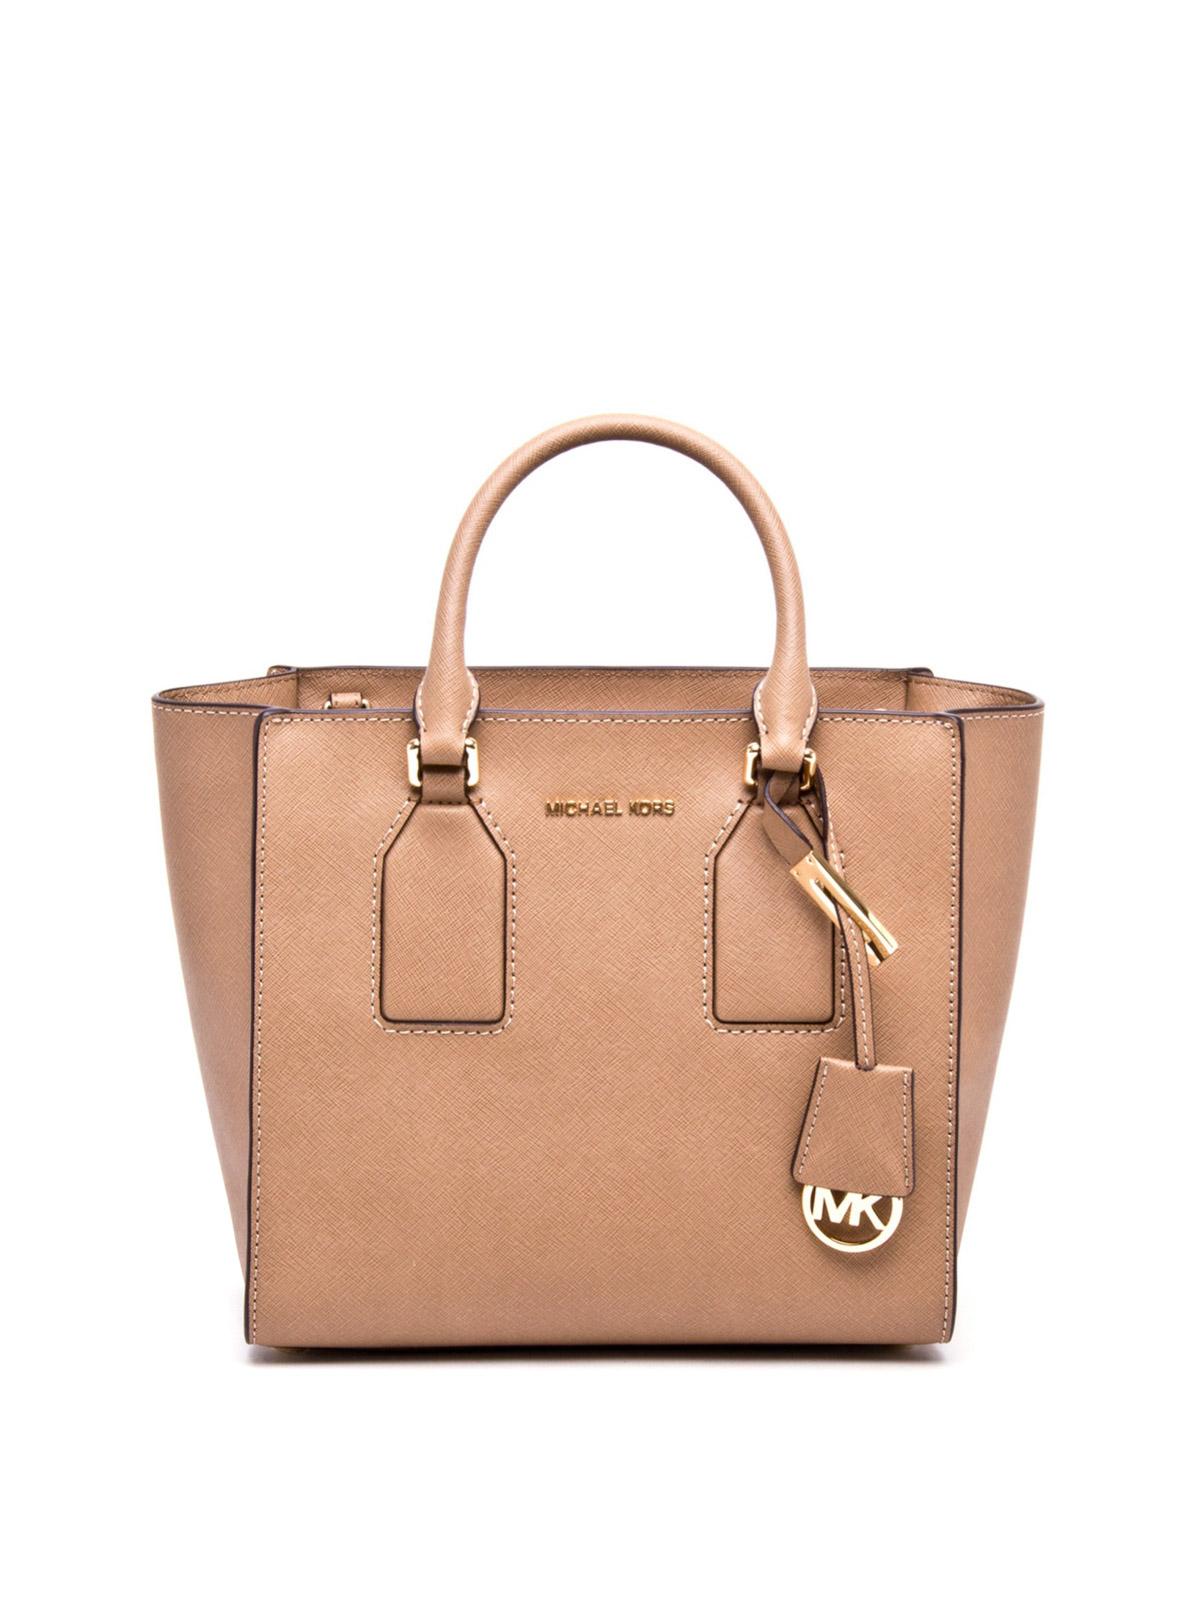 2478af5e4bcd Michael Kors Saffiano Leather Tote Bag | Stanford Center for ...